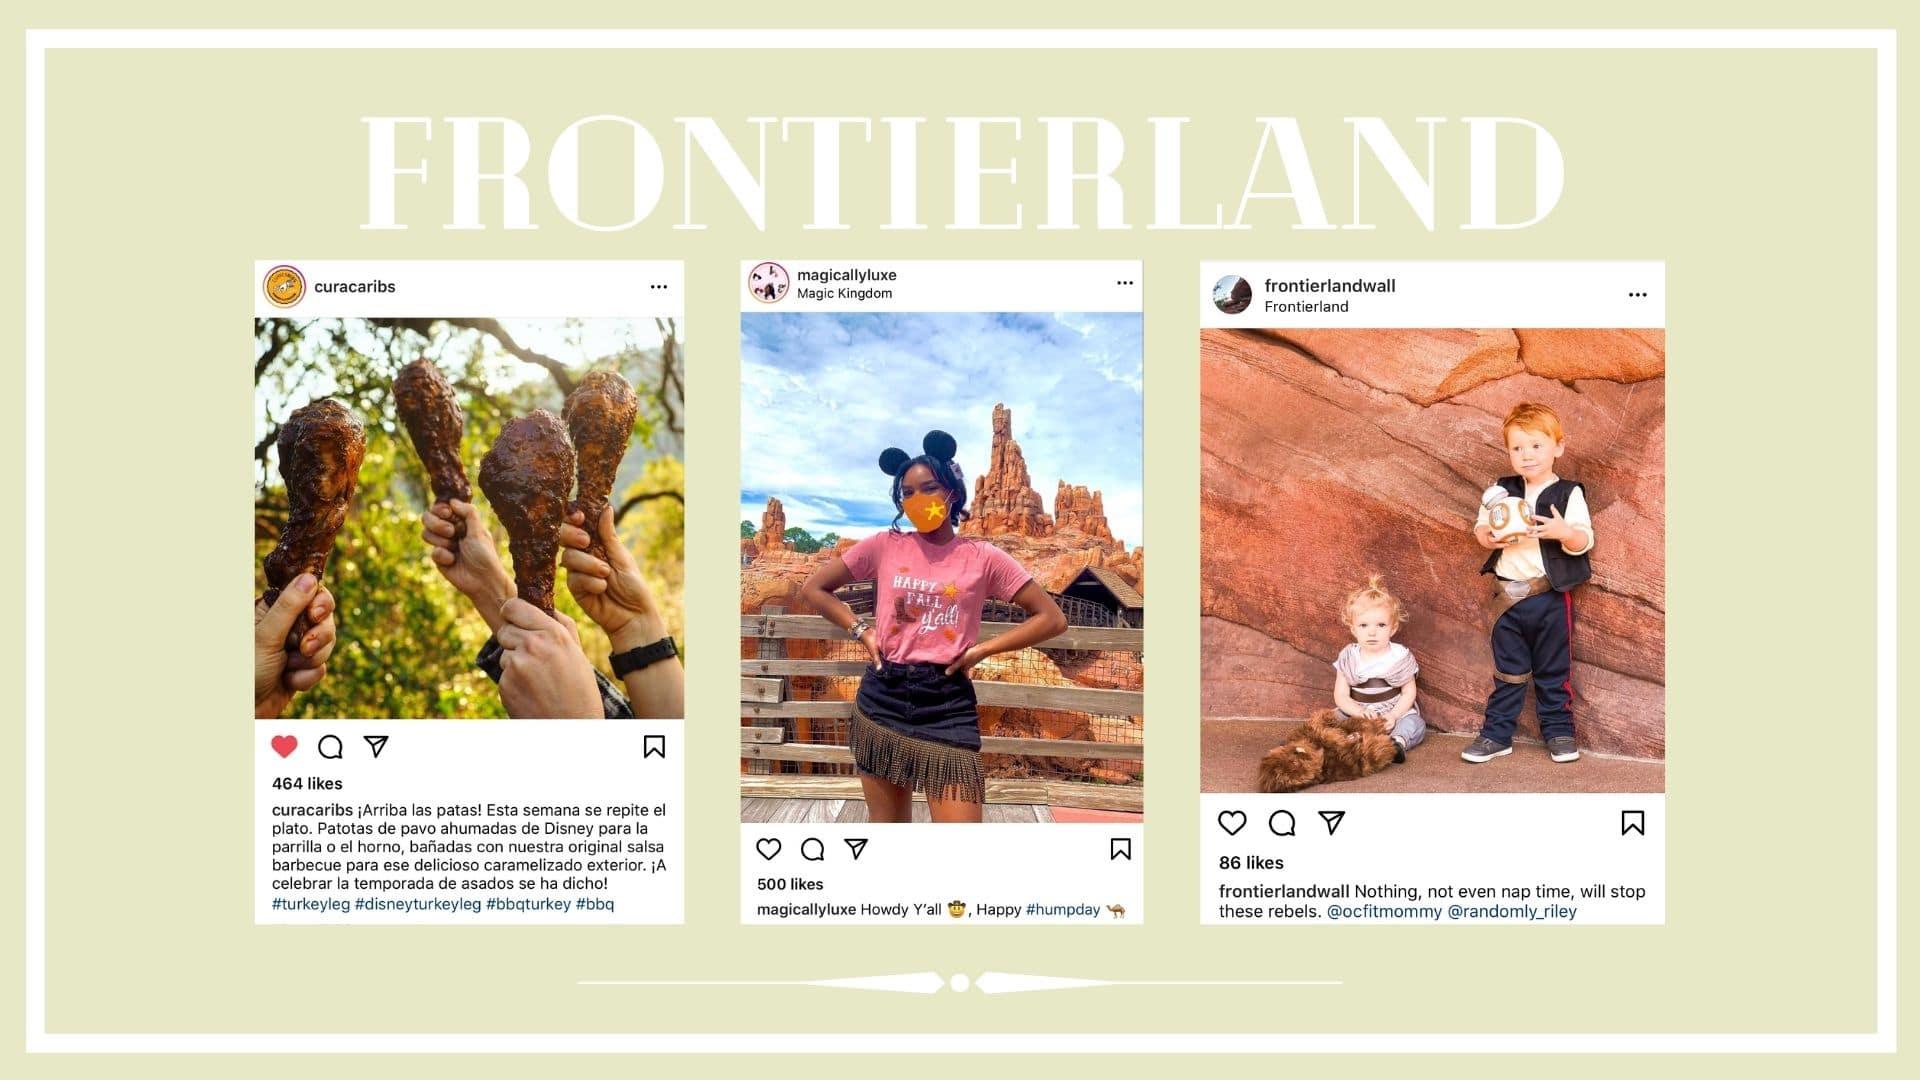 Instagram posts about frontierland at Disneyland